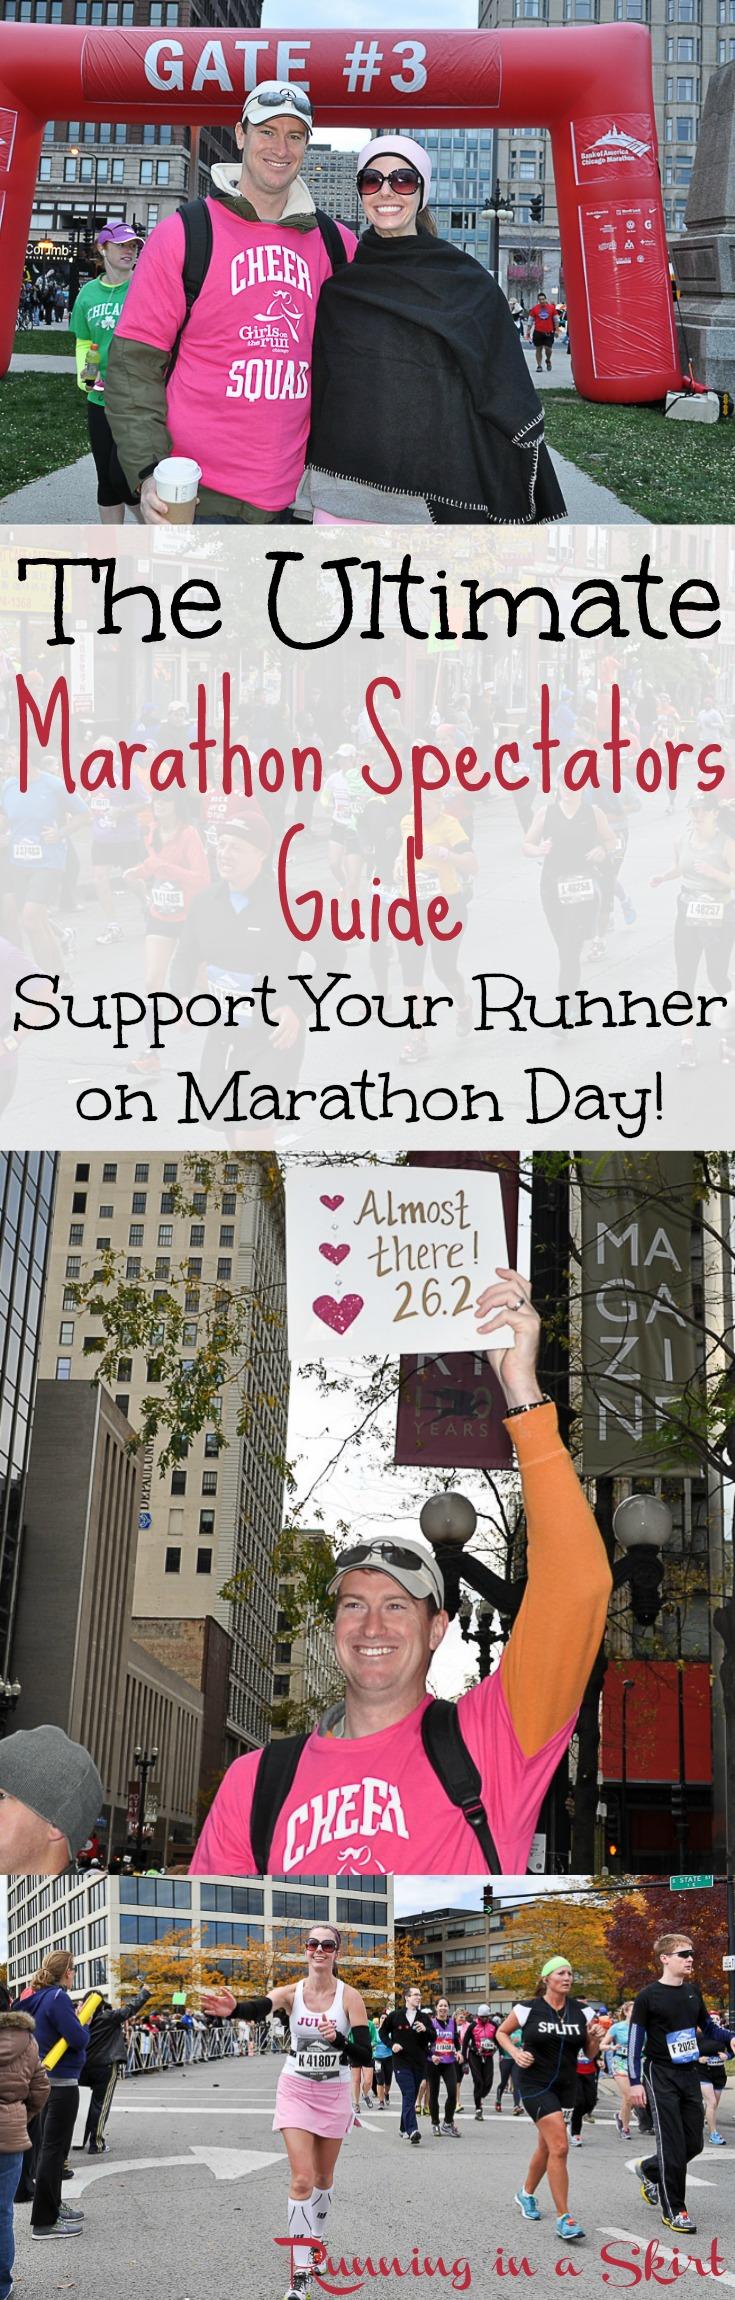 The Ultimate Marathon Specators Guide